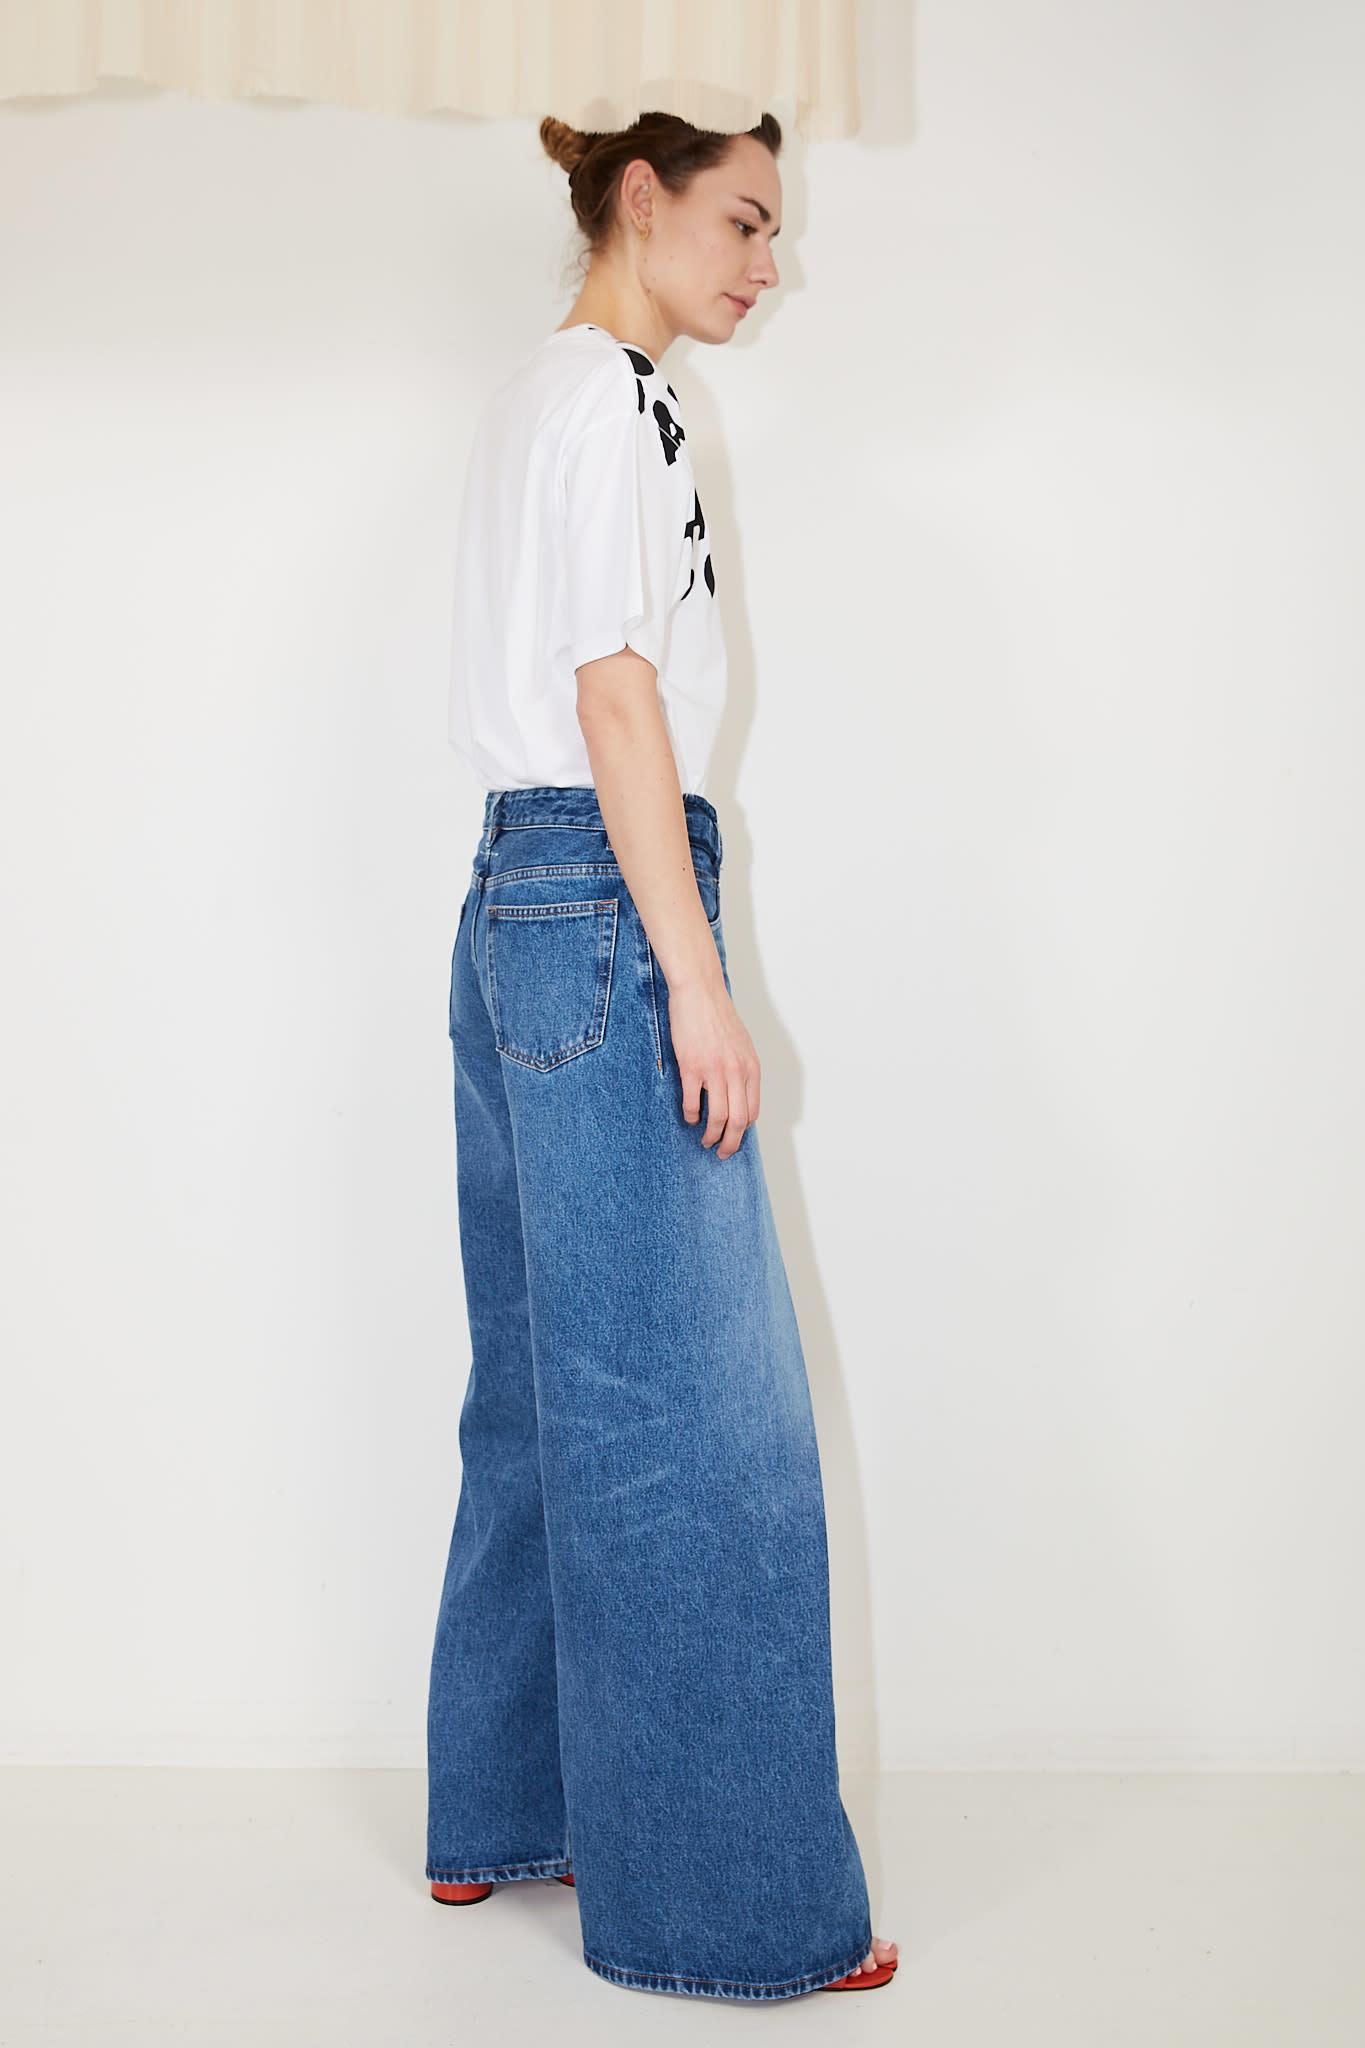 MM6 - Pants 5 pocket MM6